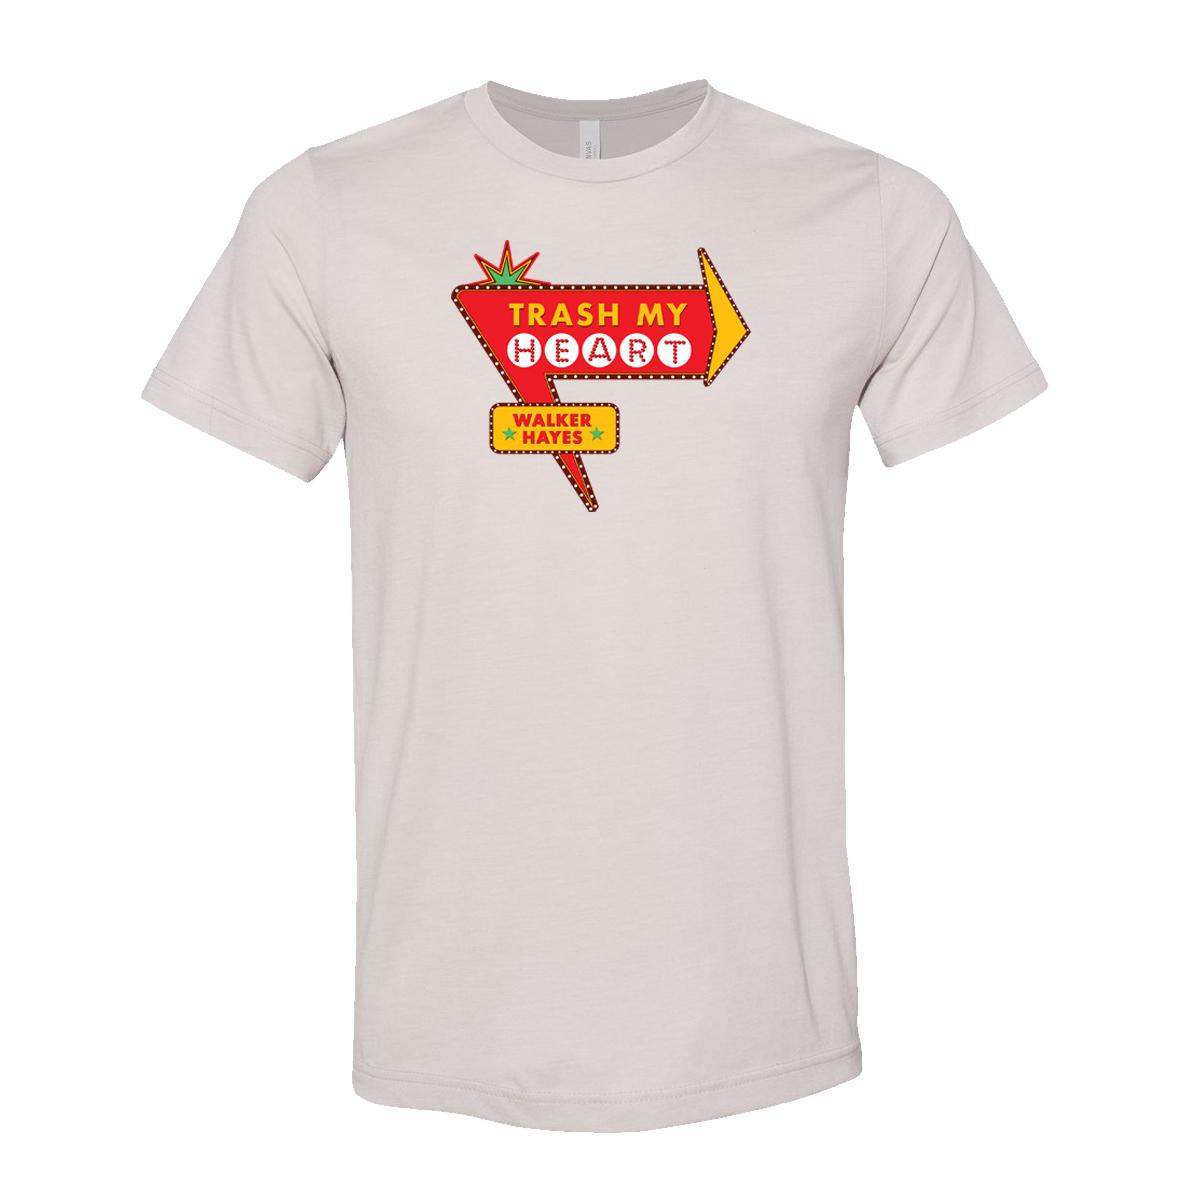 Walker Hayes Trash My Heart T-shirt